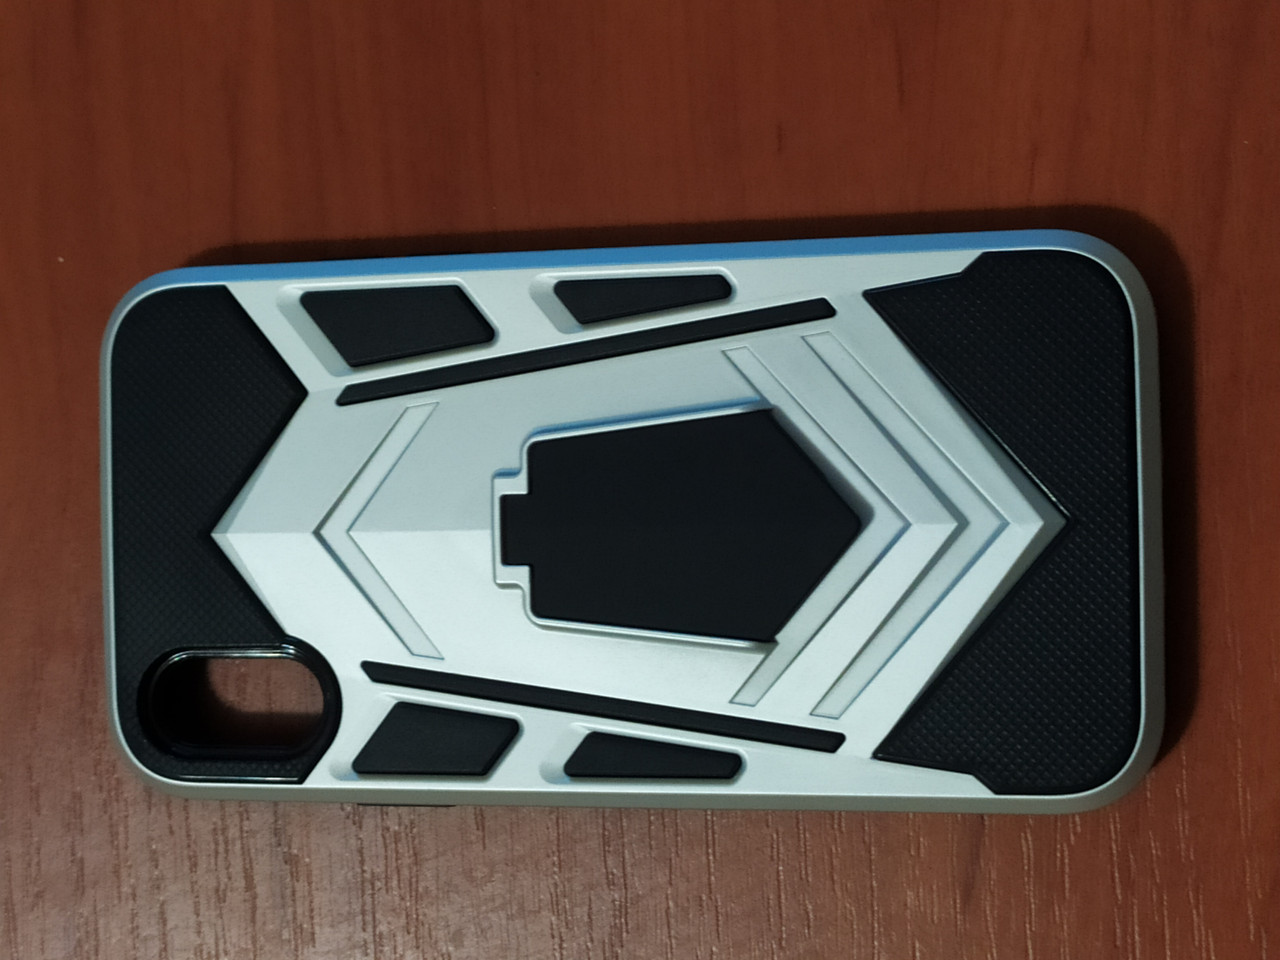 Накладка  Armor Case  iPhone X / XS 5.8  с подставкой  (серебро)